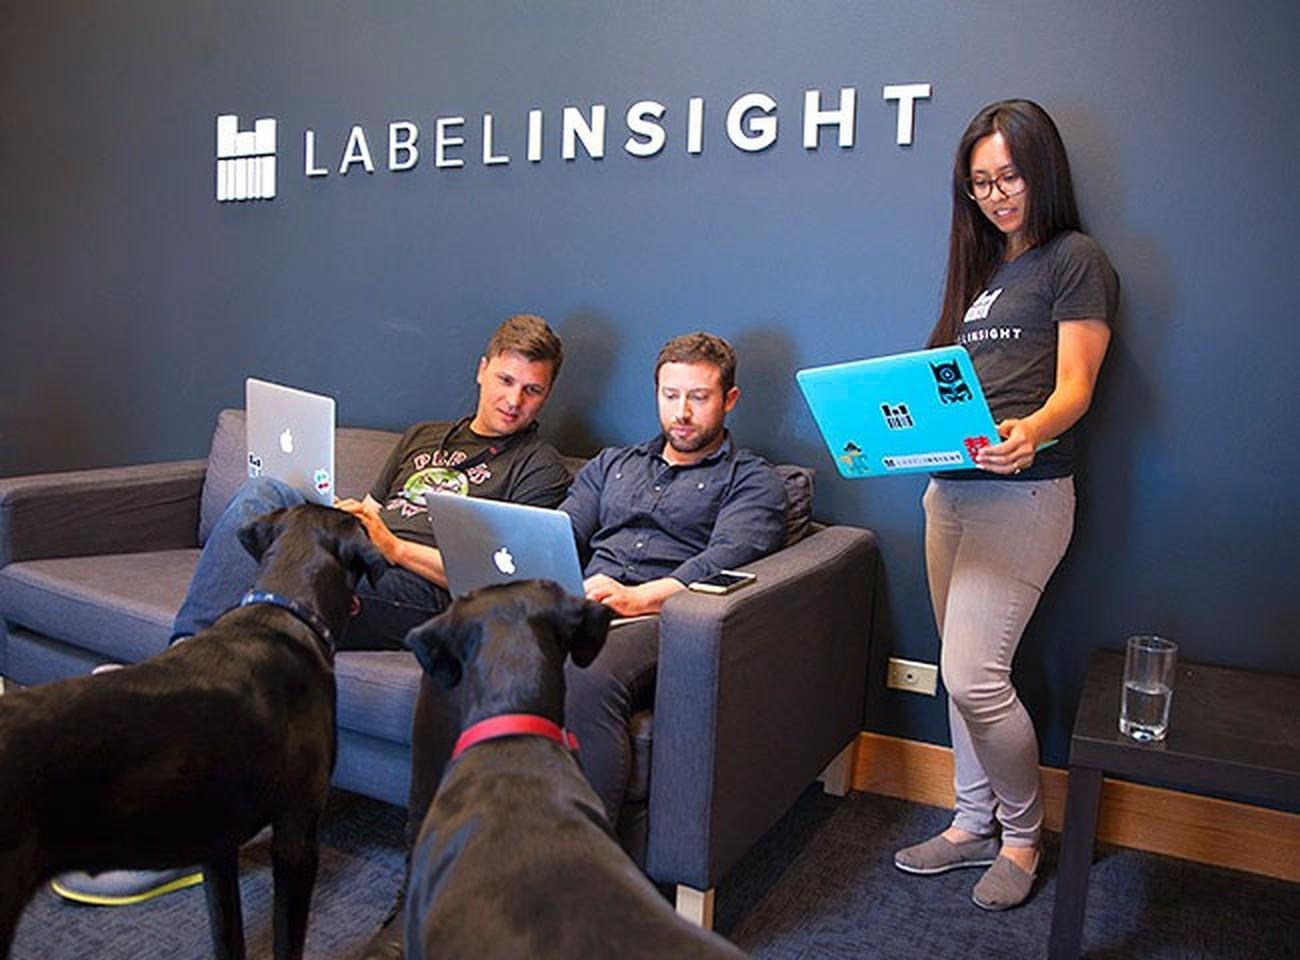 Label Insight Careers